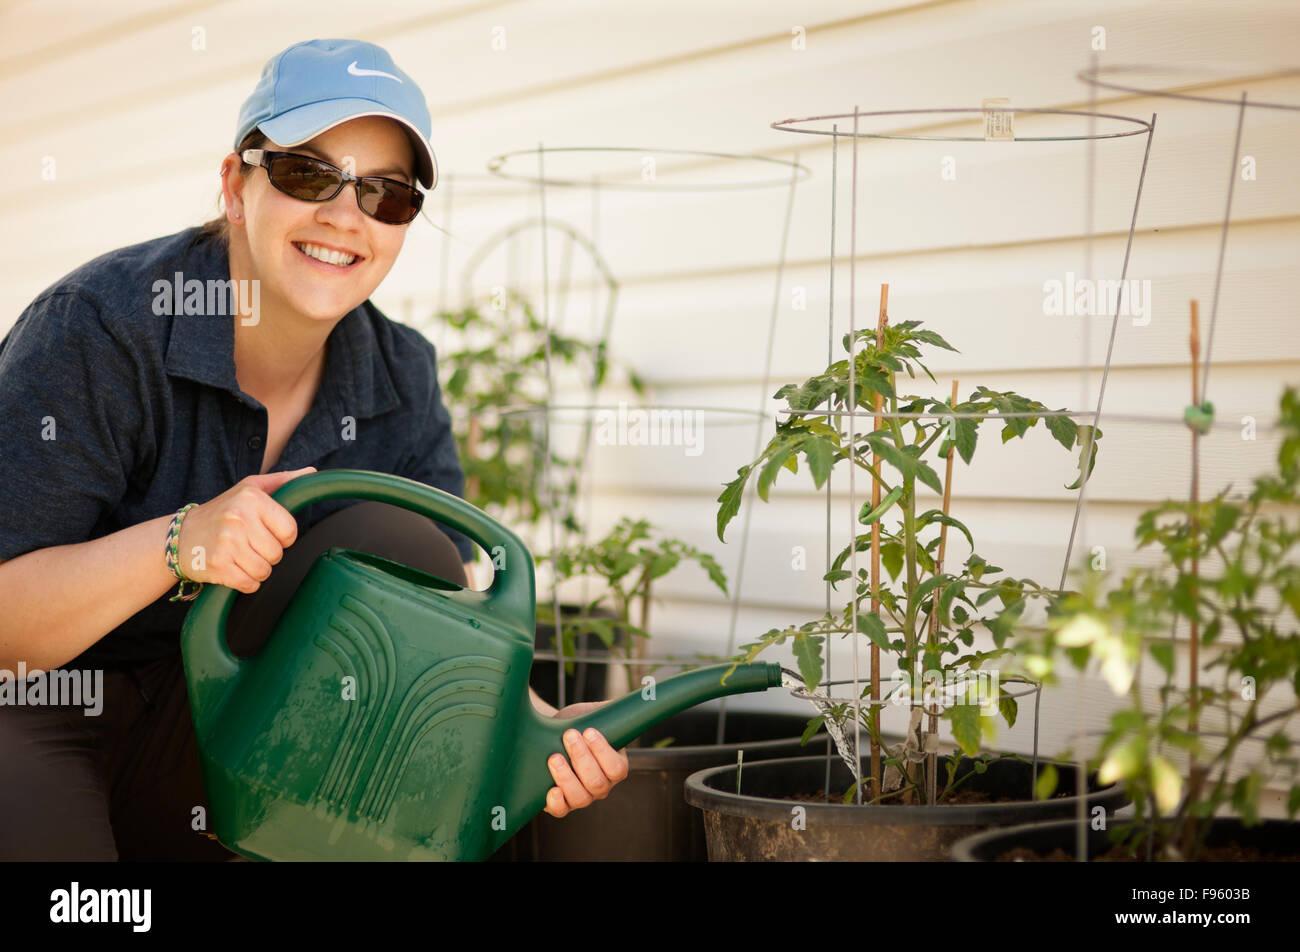 Woman watering tomatoe plants  Model Released - Stock Image